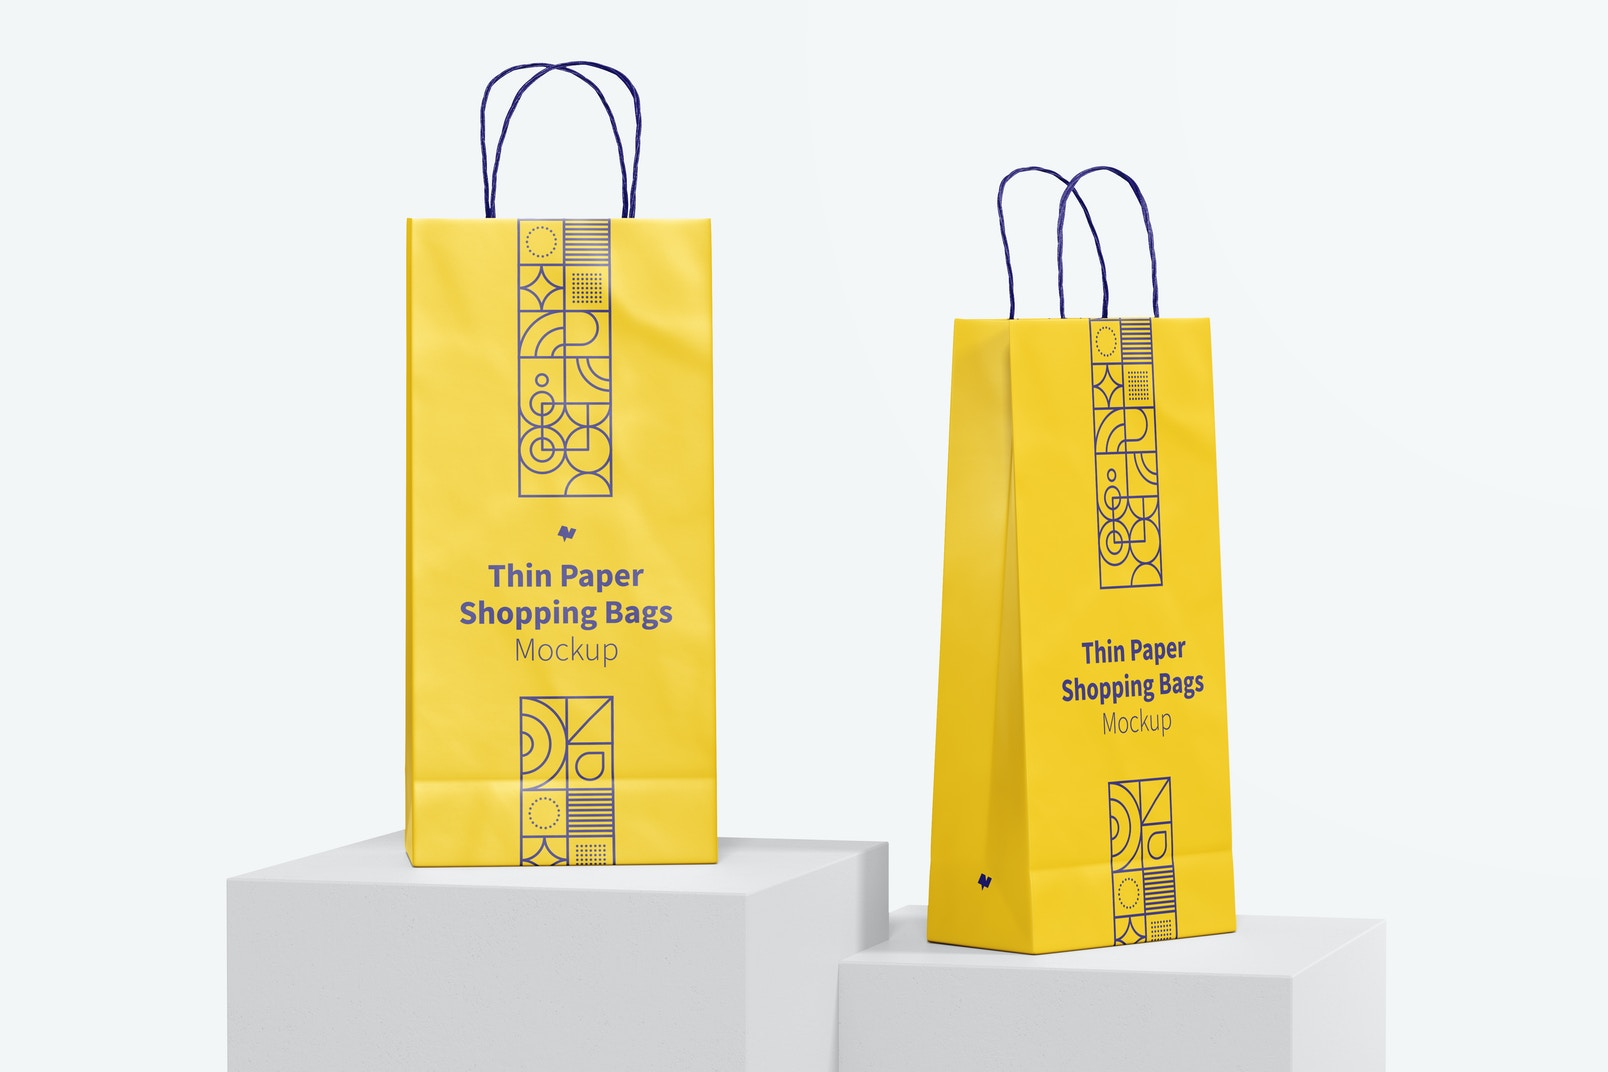 Thin Paper Shopping Bags Mockup